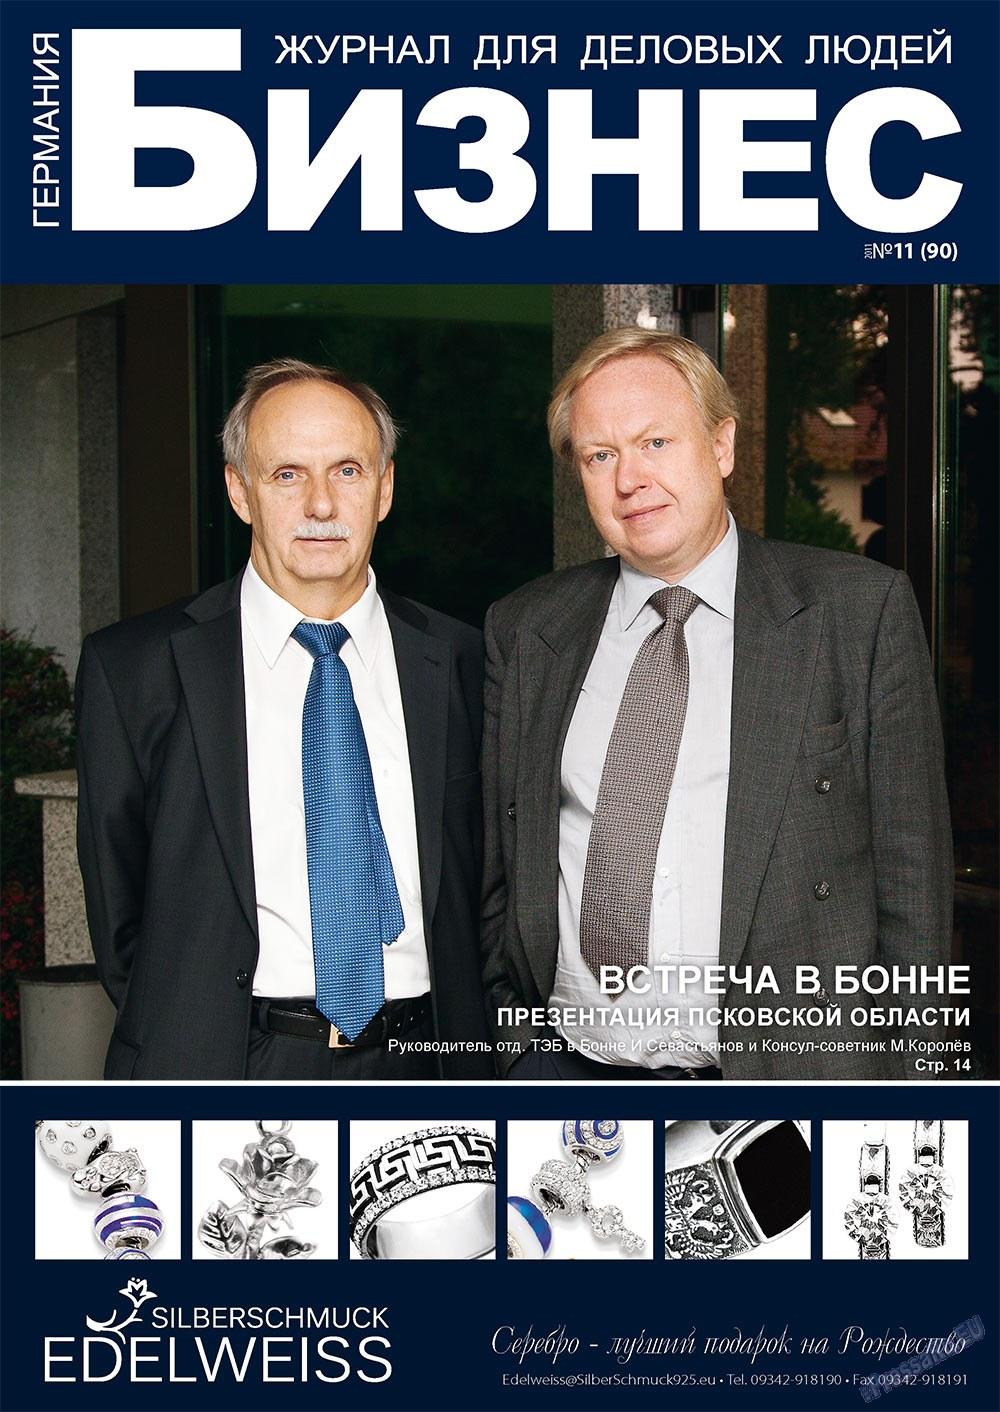 Бизнес (журнал). 2011 год, номер 11, стр. 1